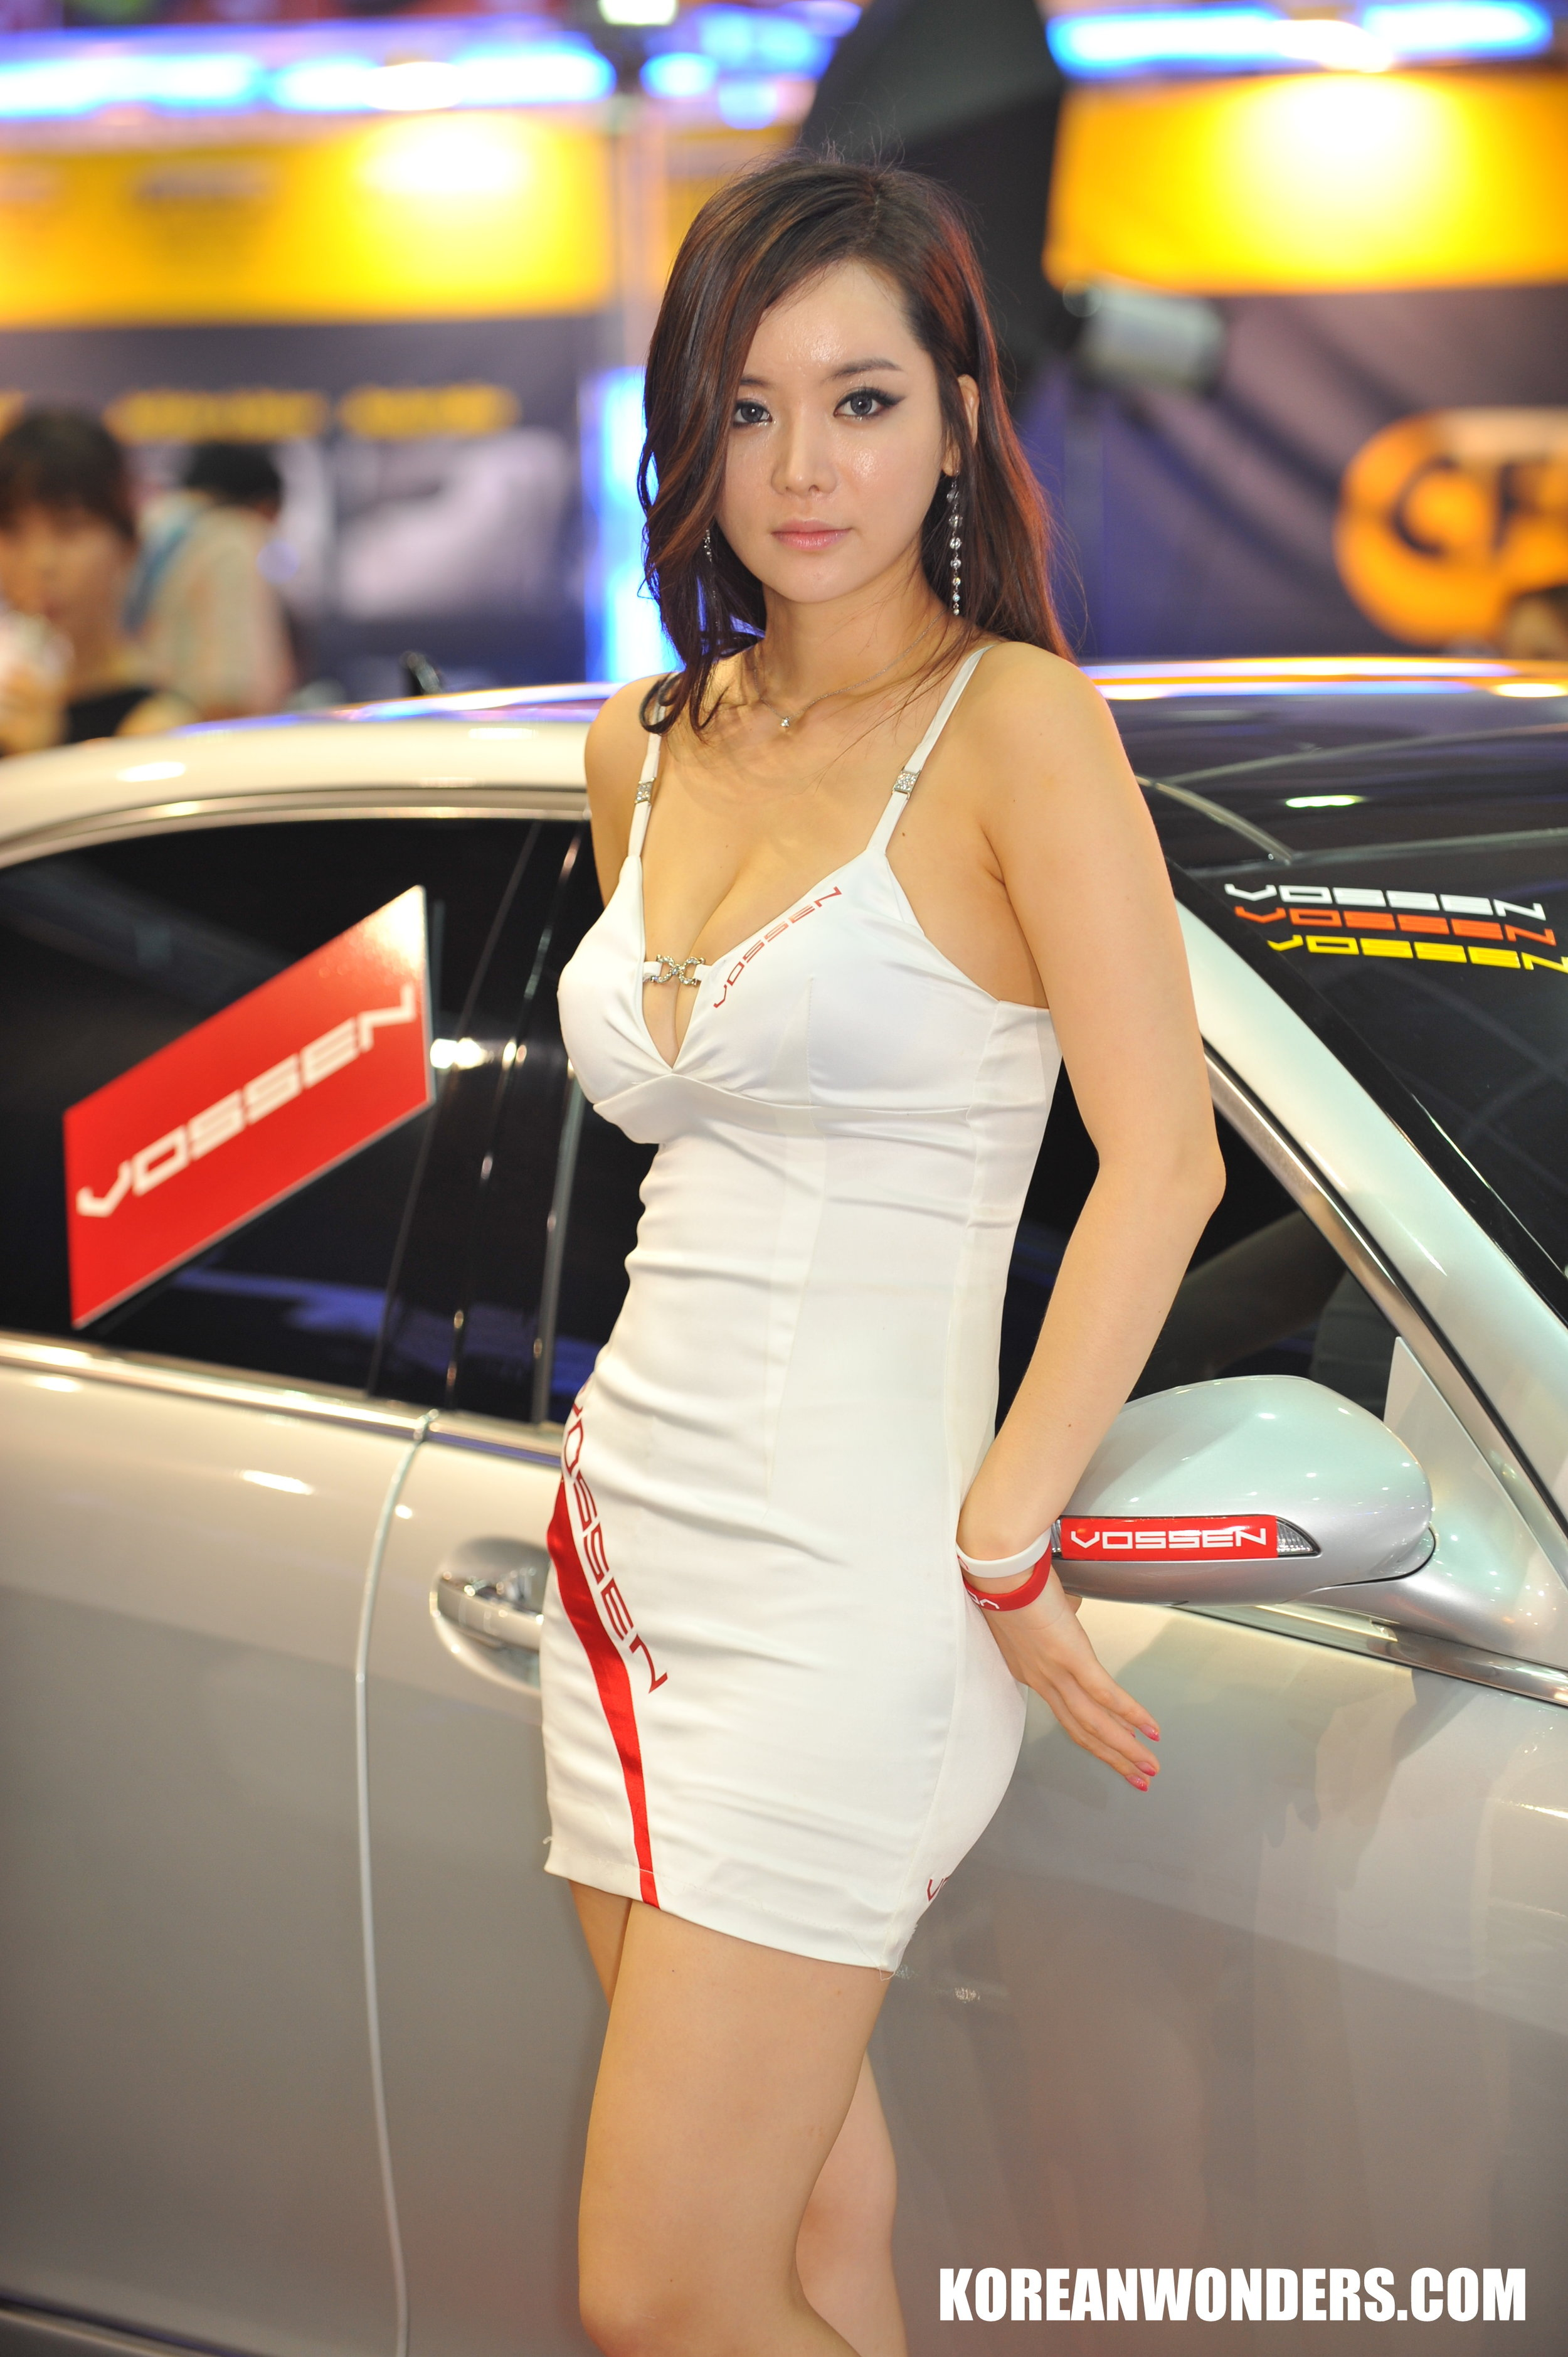 IM Ji Hye (KOREANWONDERS.COM)